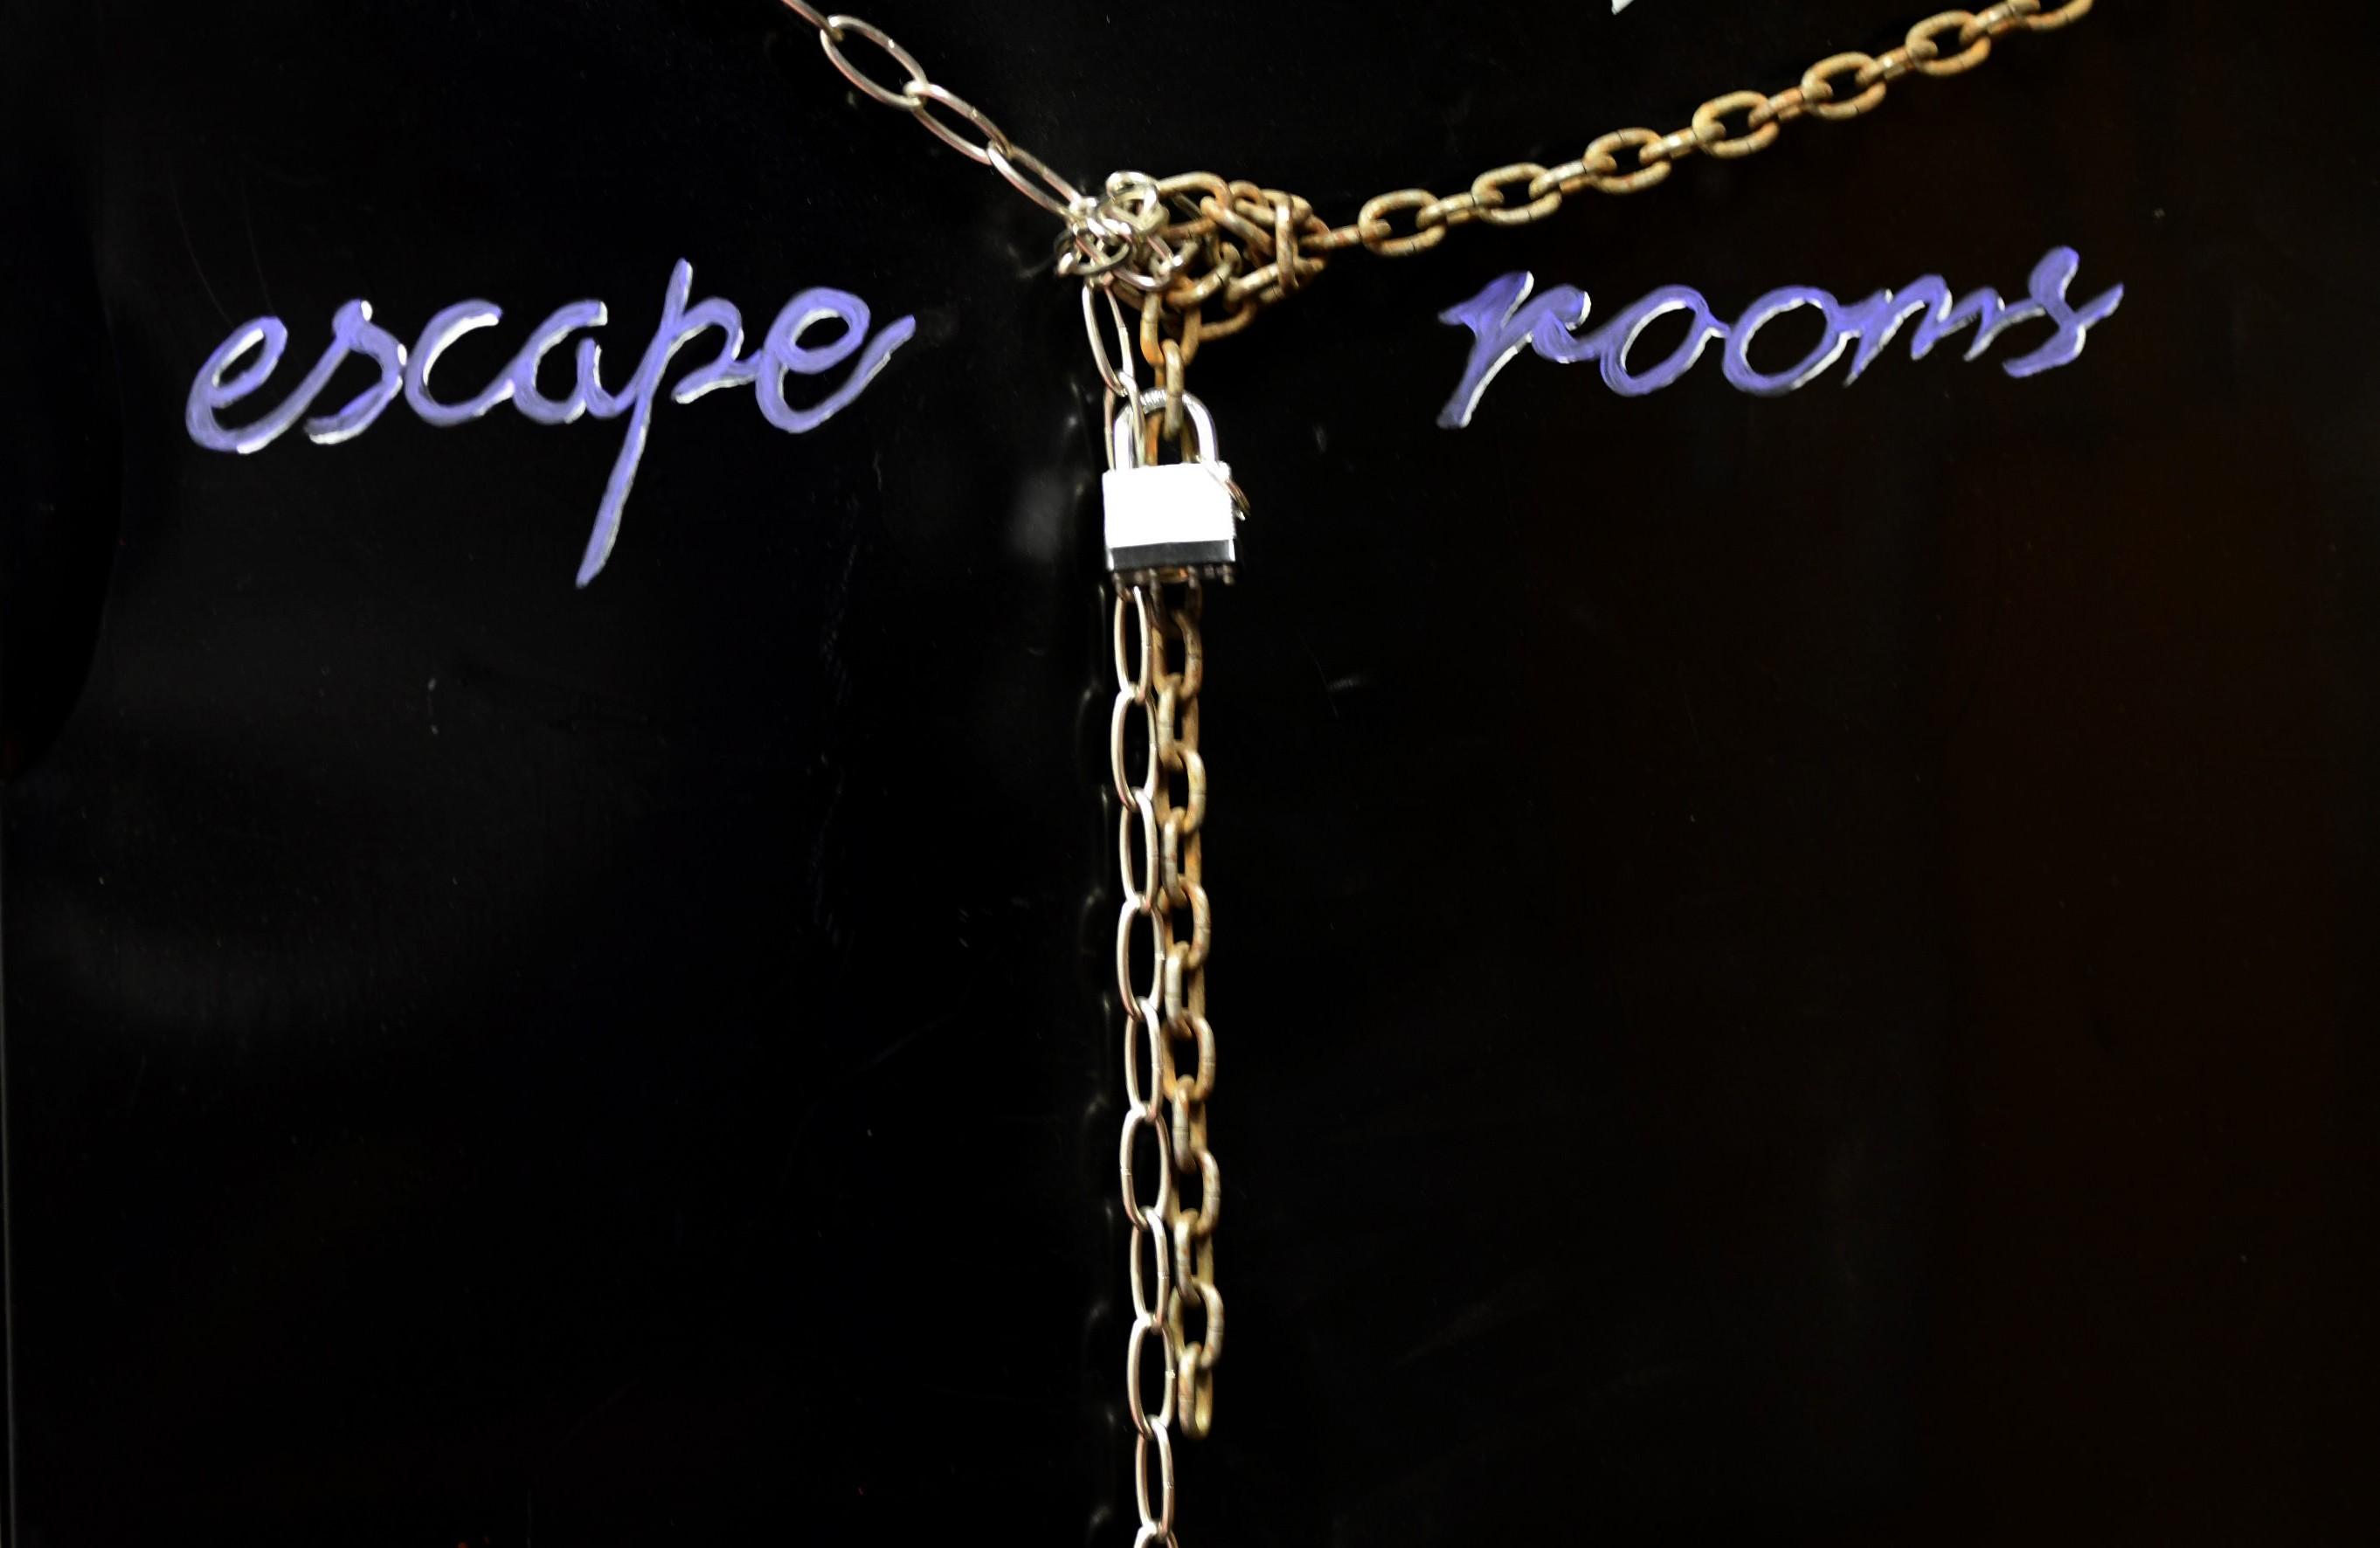 Escape Room for double truck - TRIBUNE/STEVE HANKS